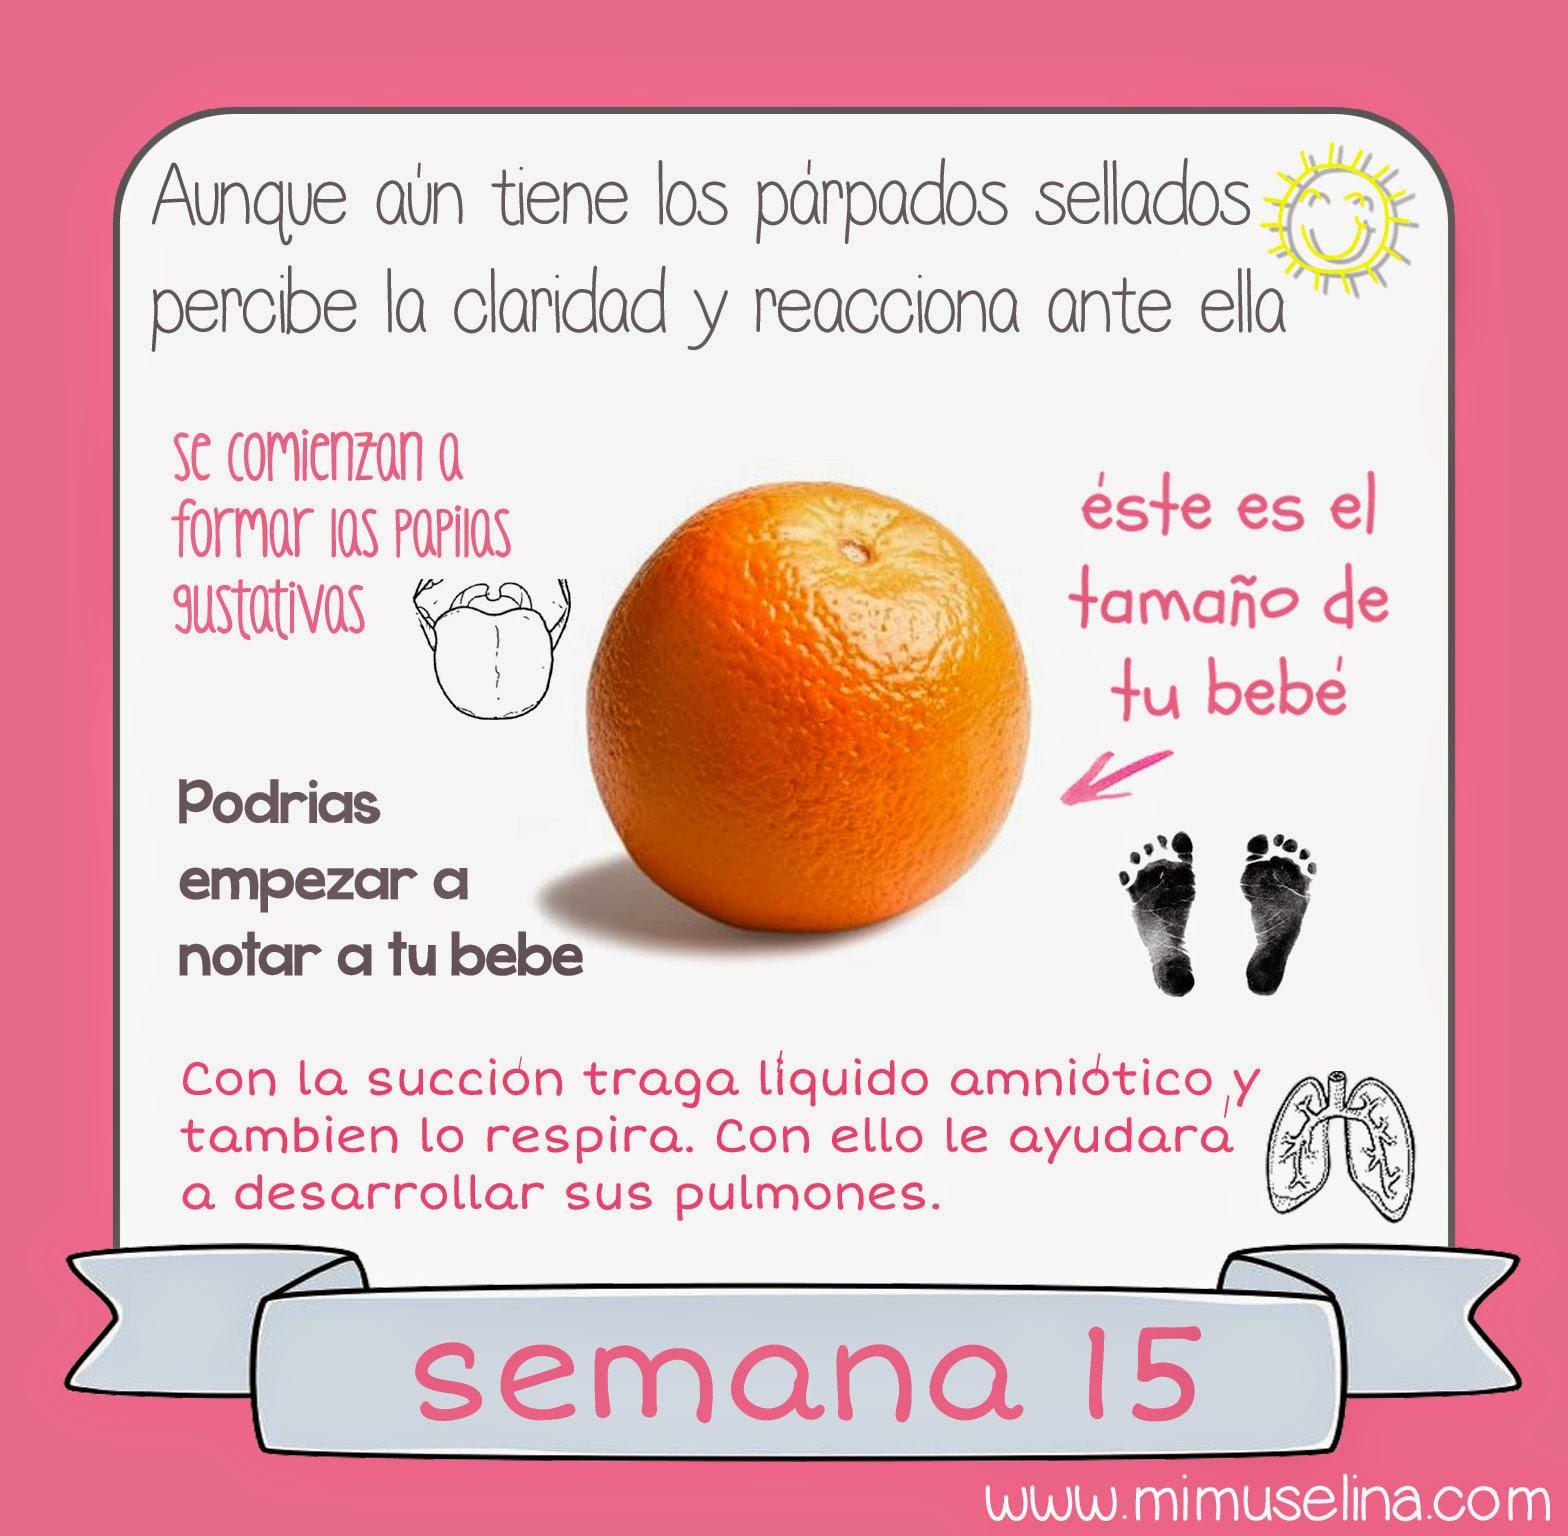 Semana 14 embarazo fruta